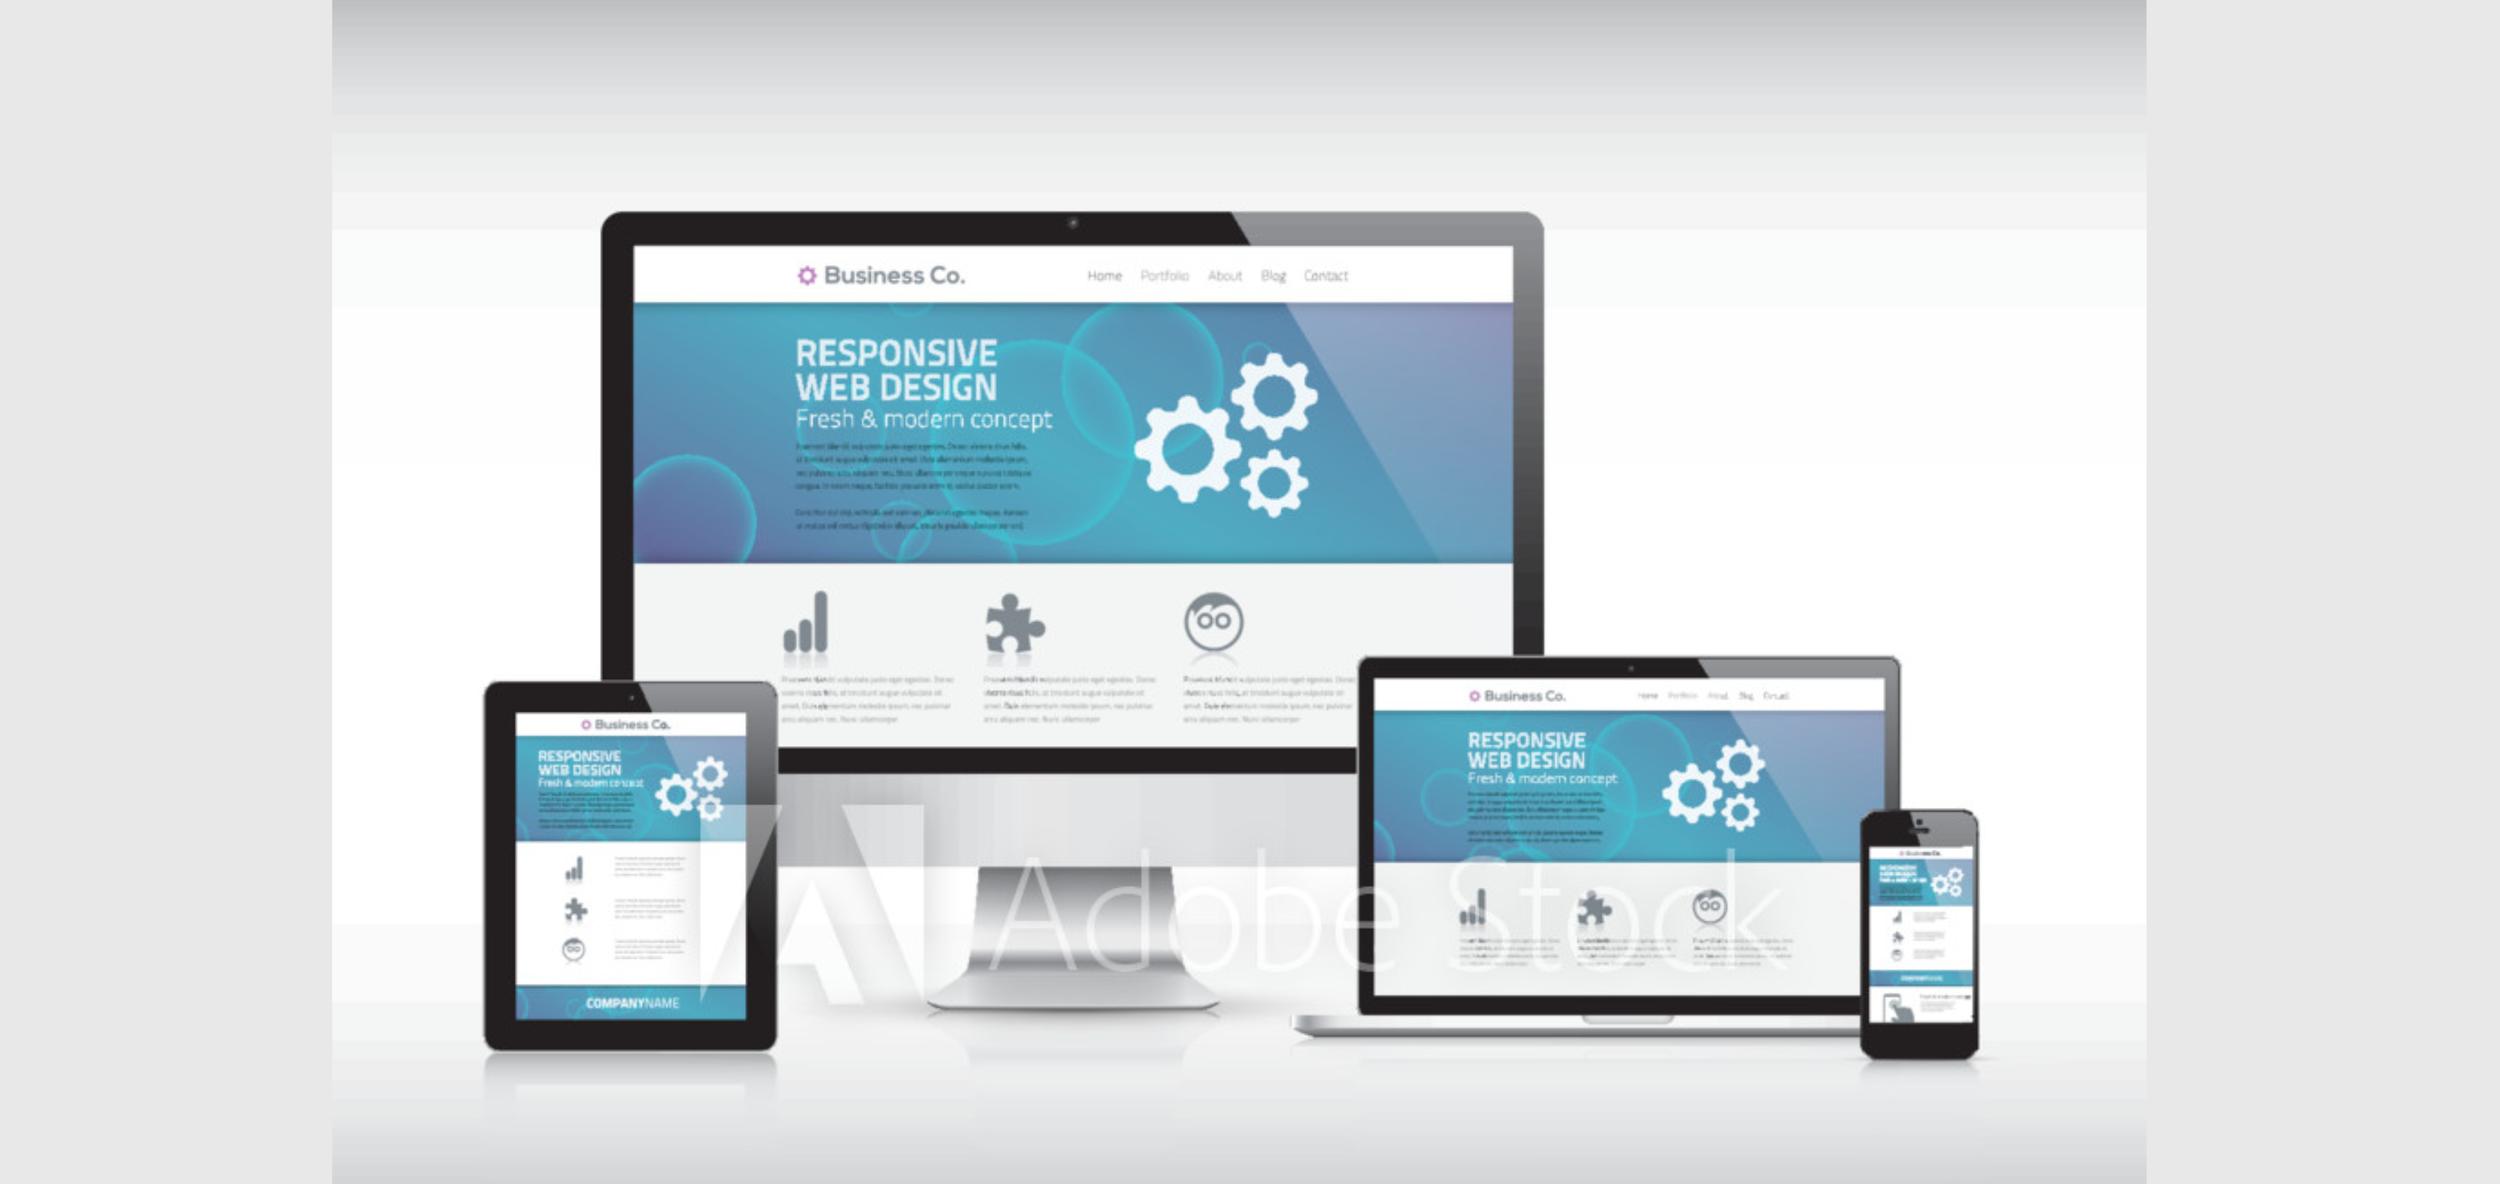 Homepage_Xo.com-13.png